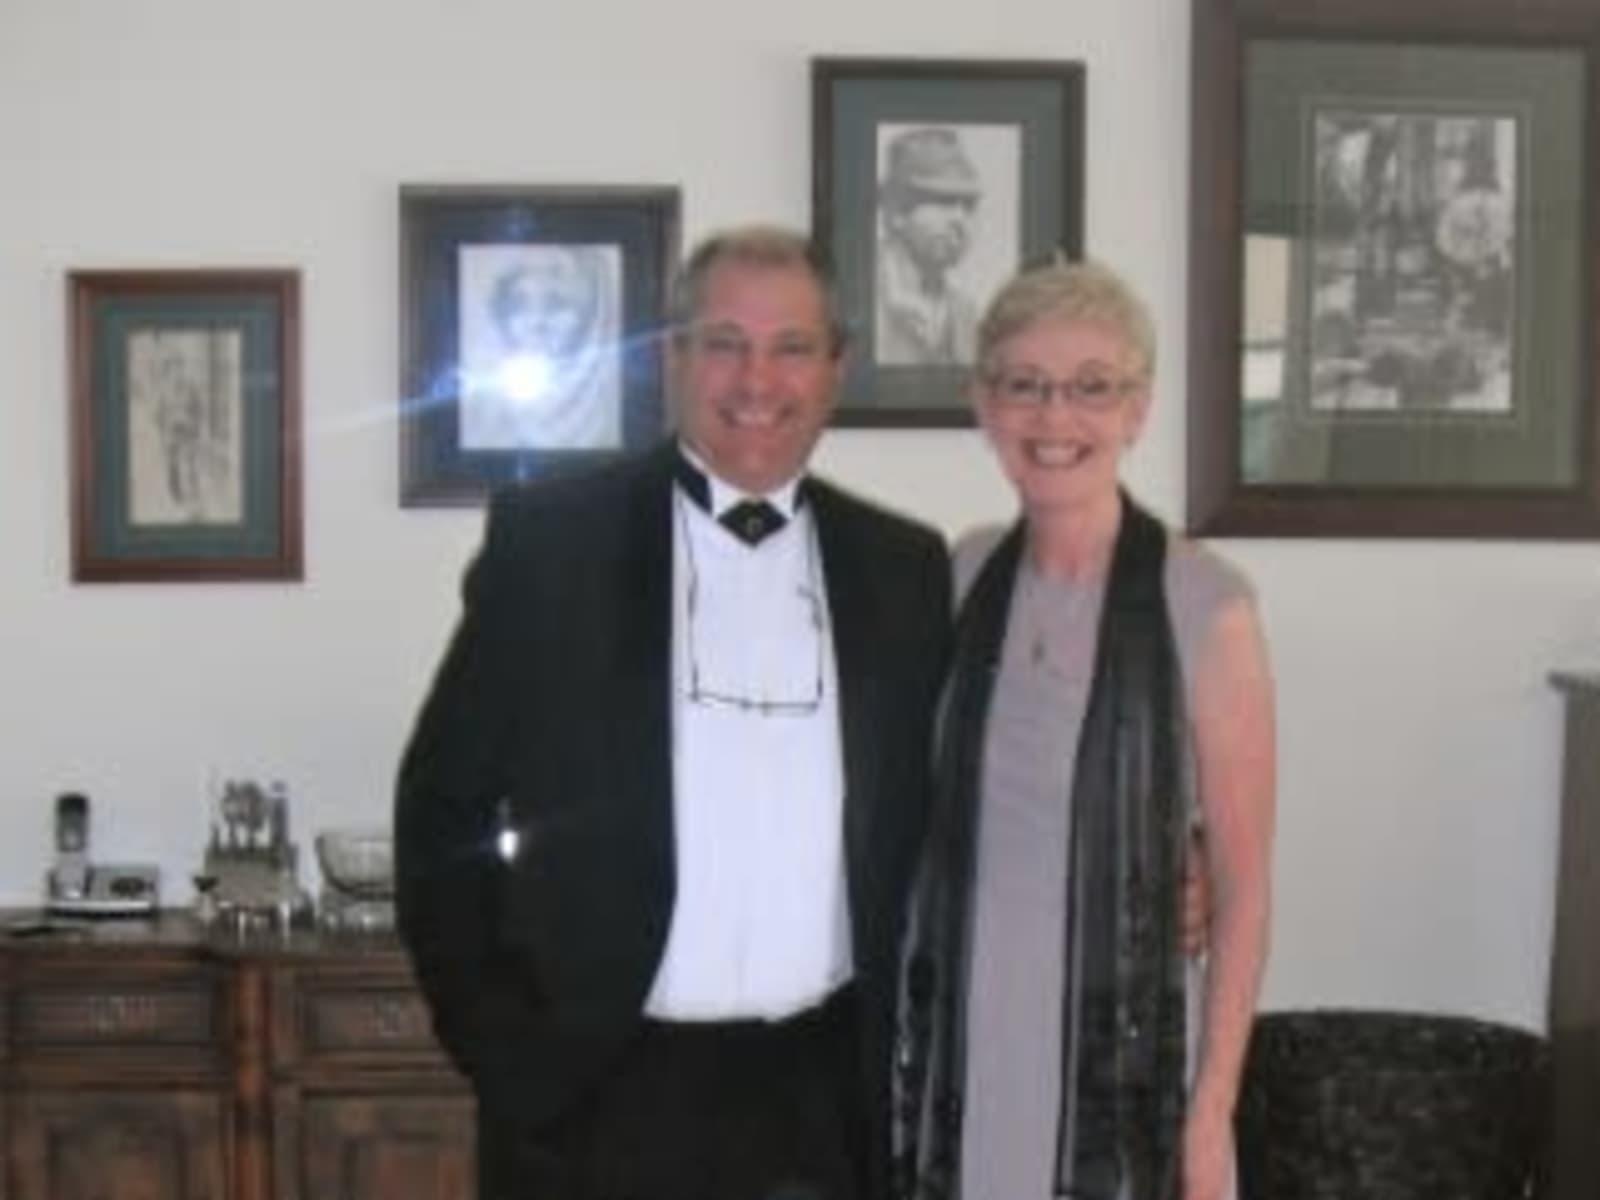 Jane & Michael from Caloundra, Queensland, Australia